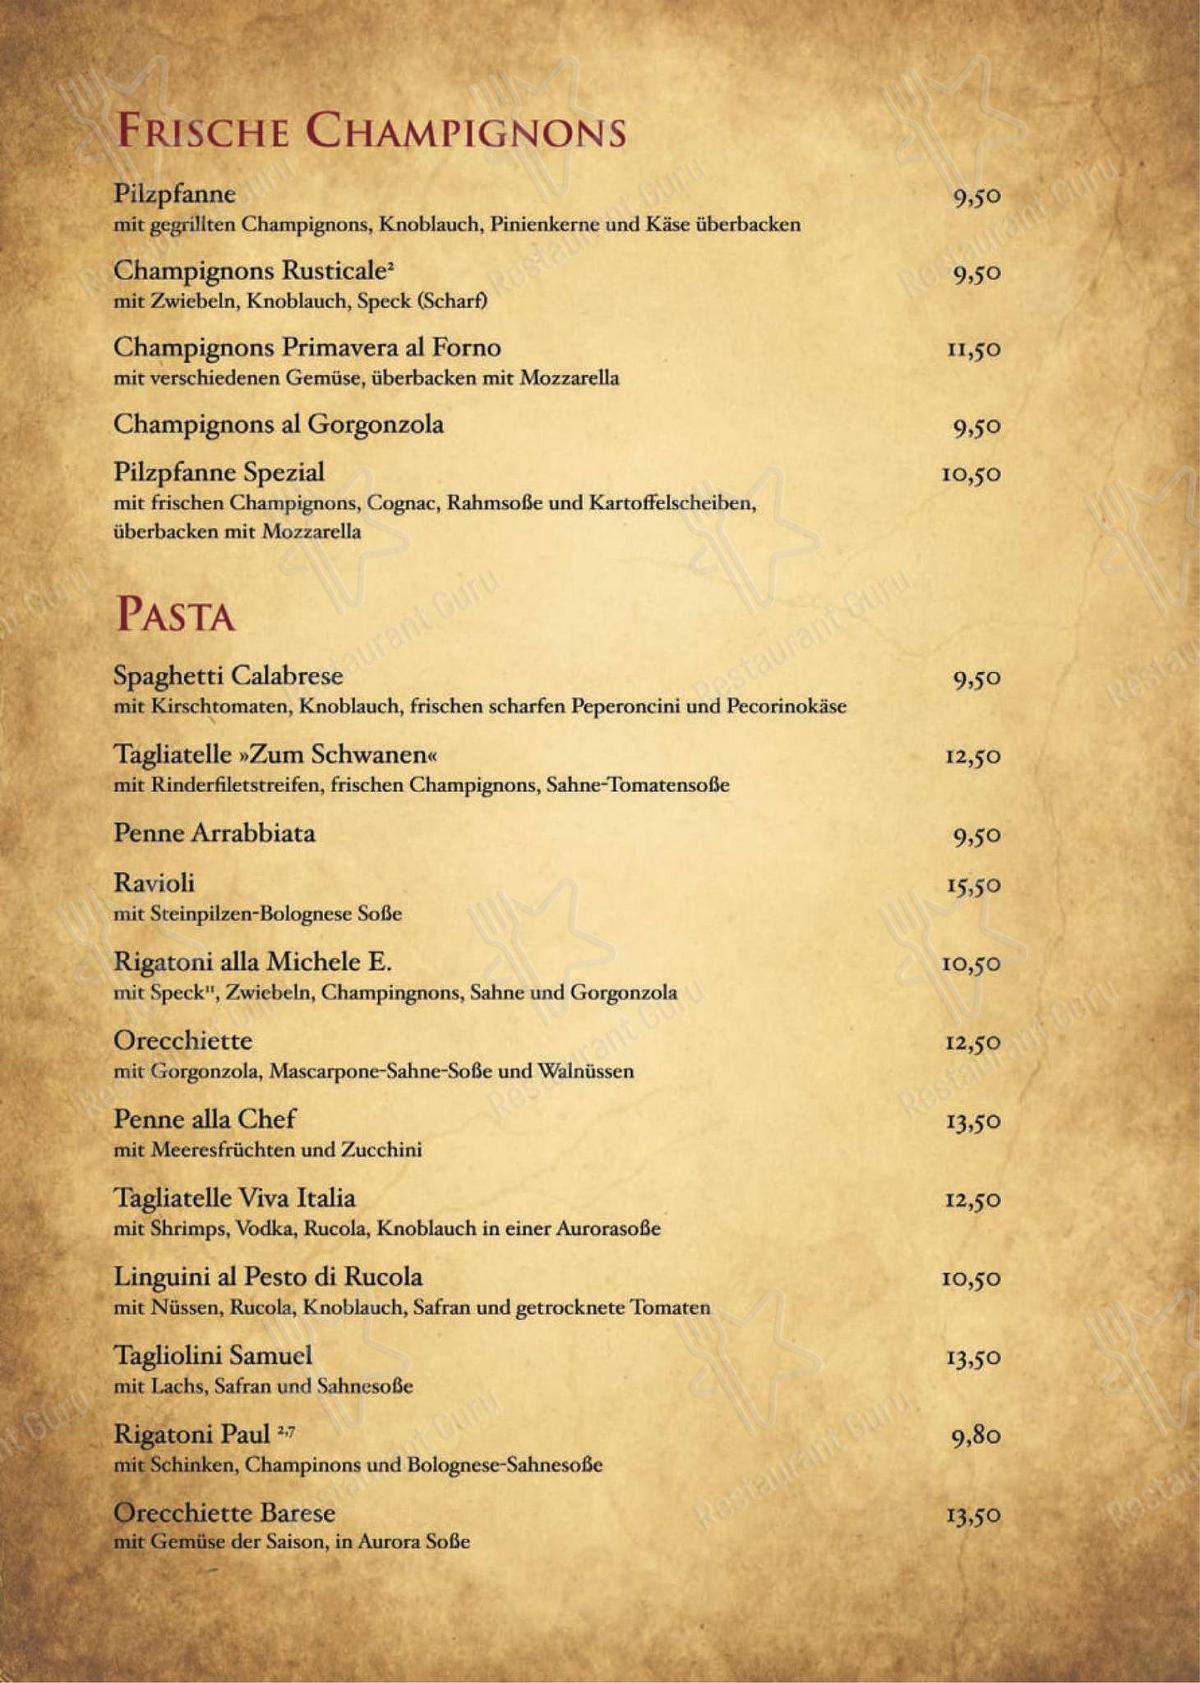 Carta de Ristorante Pizzeria Zum Schwanen restaurante